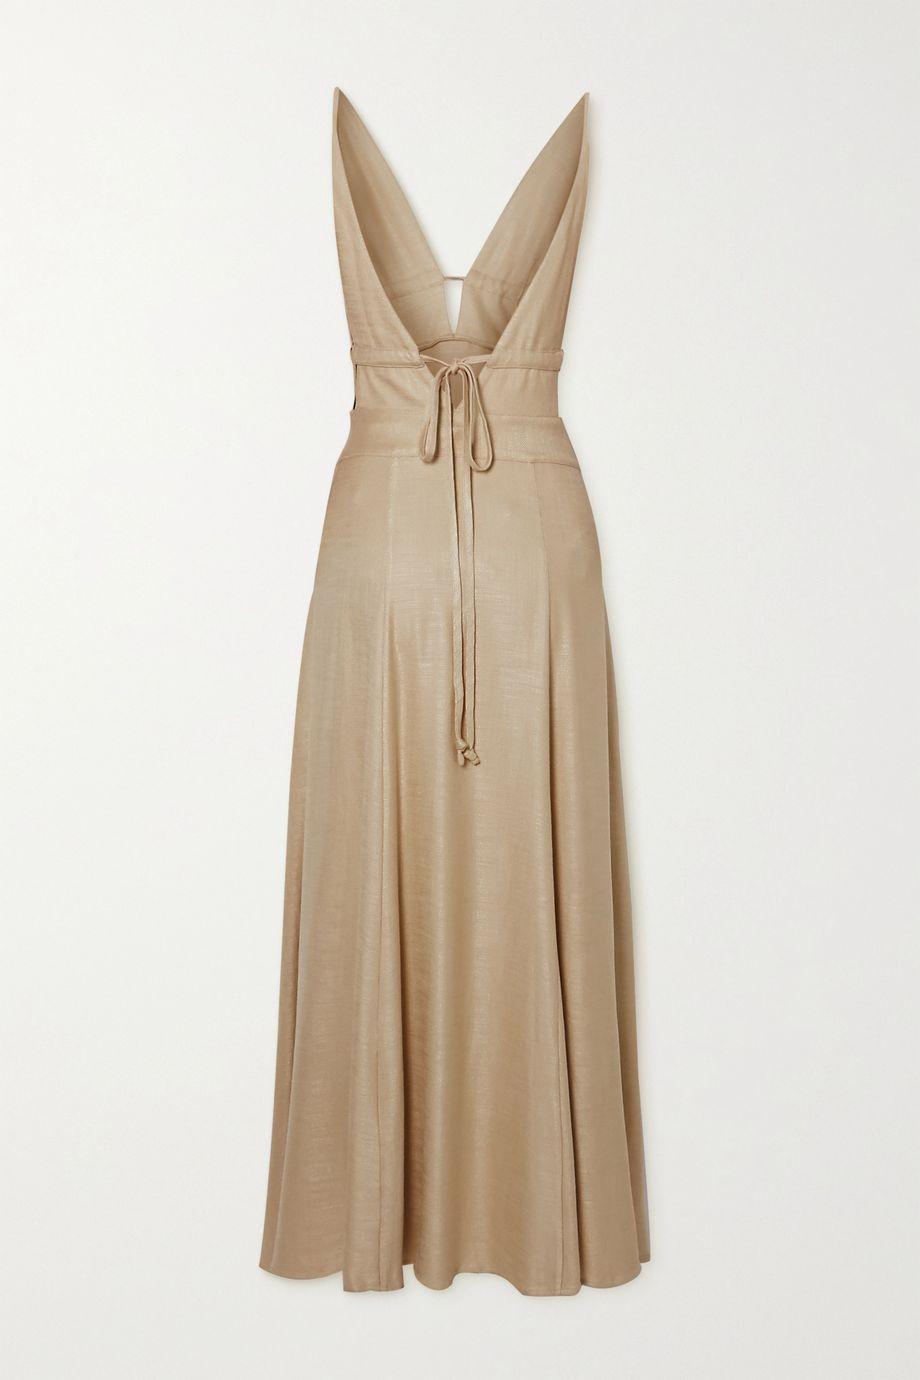 Cult Gaia Margot tie-front stretch-voile midi dress